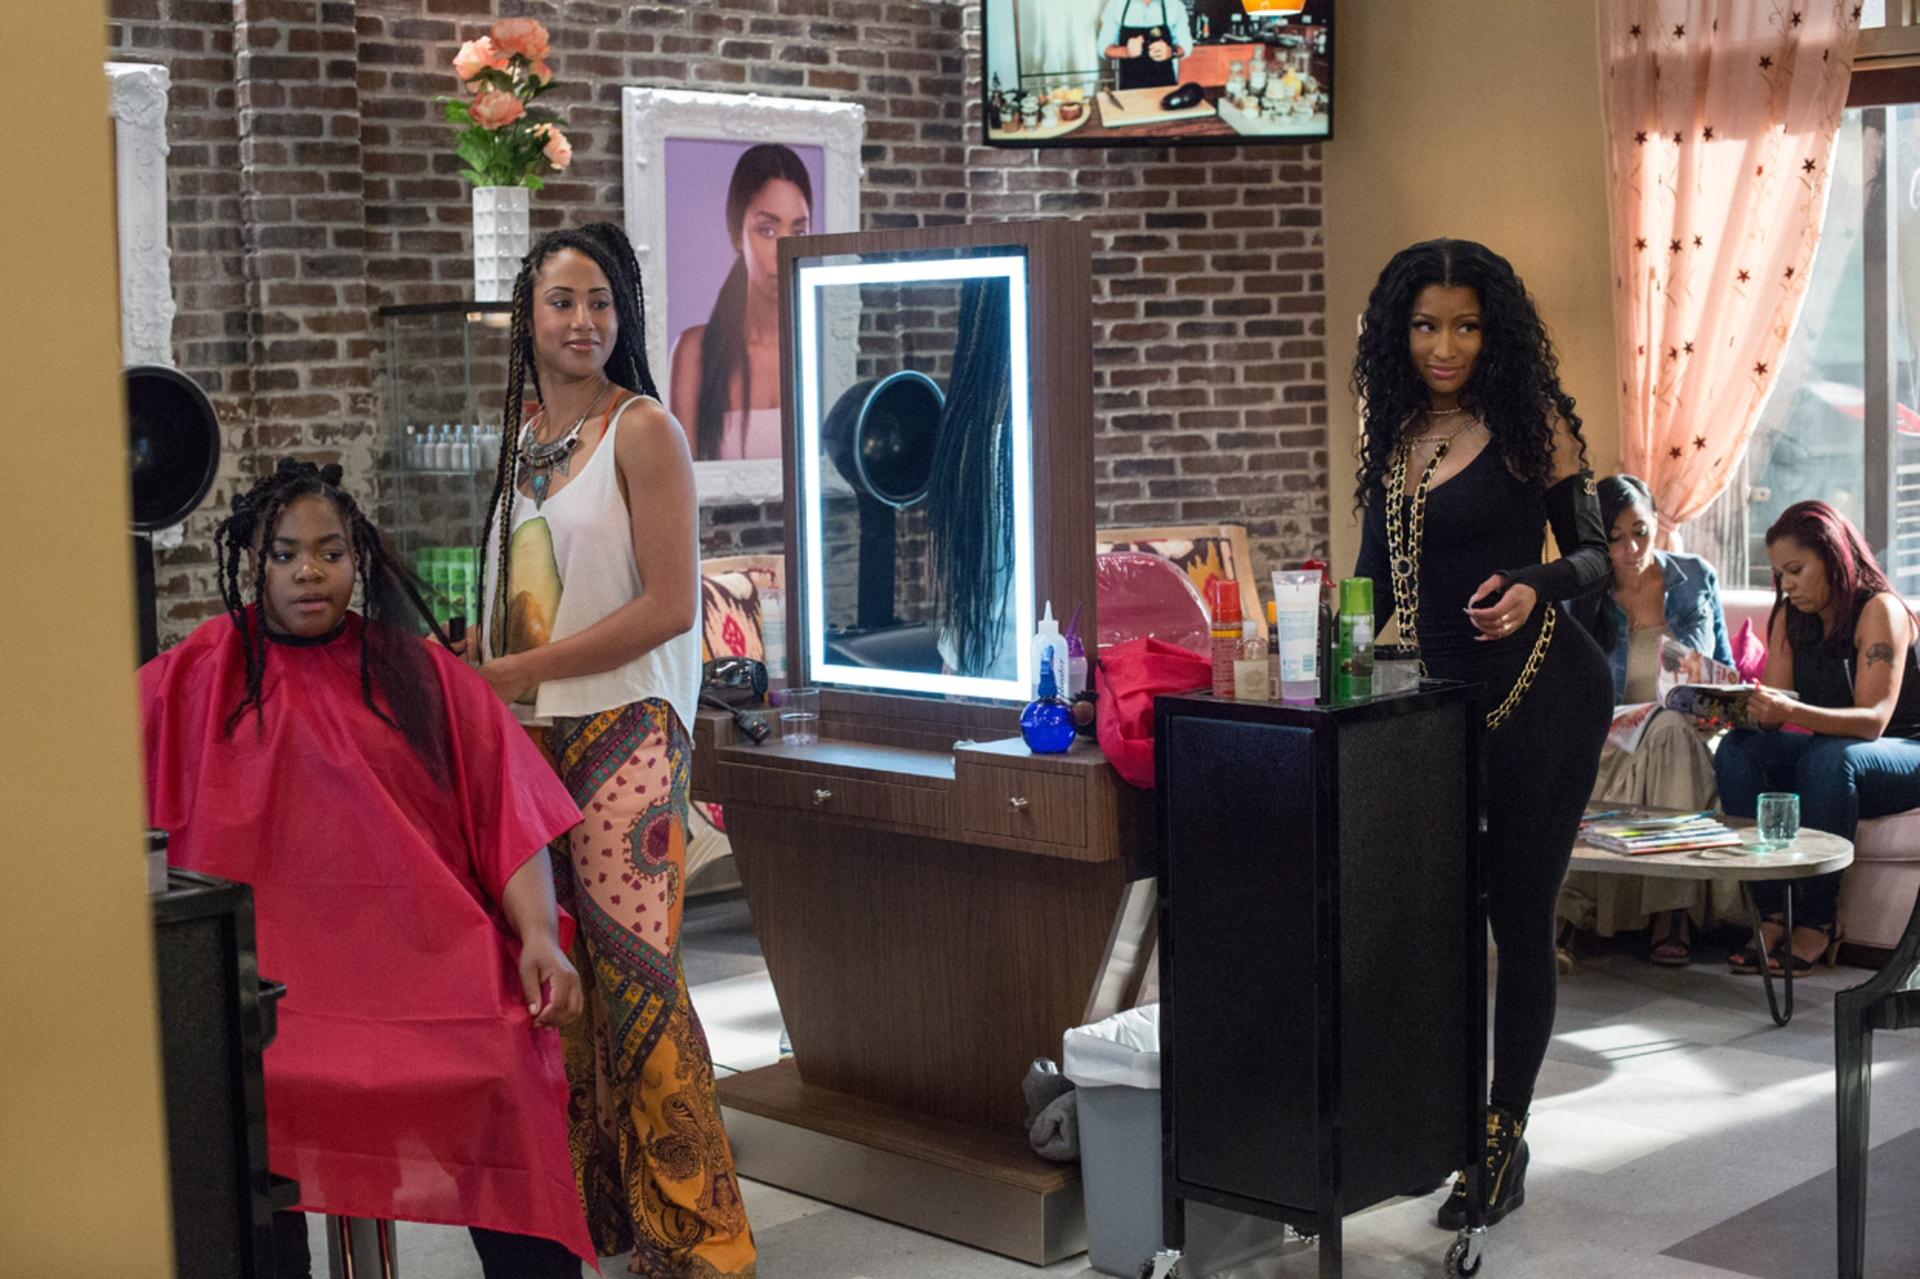 MARGOT BINGHAM as Bree and NICKI MINAJ as Draya in Barbershop: The Next Cut